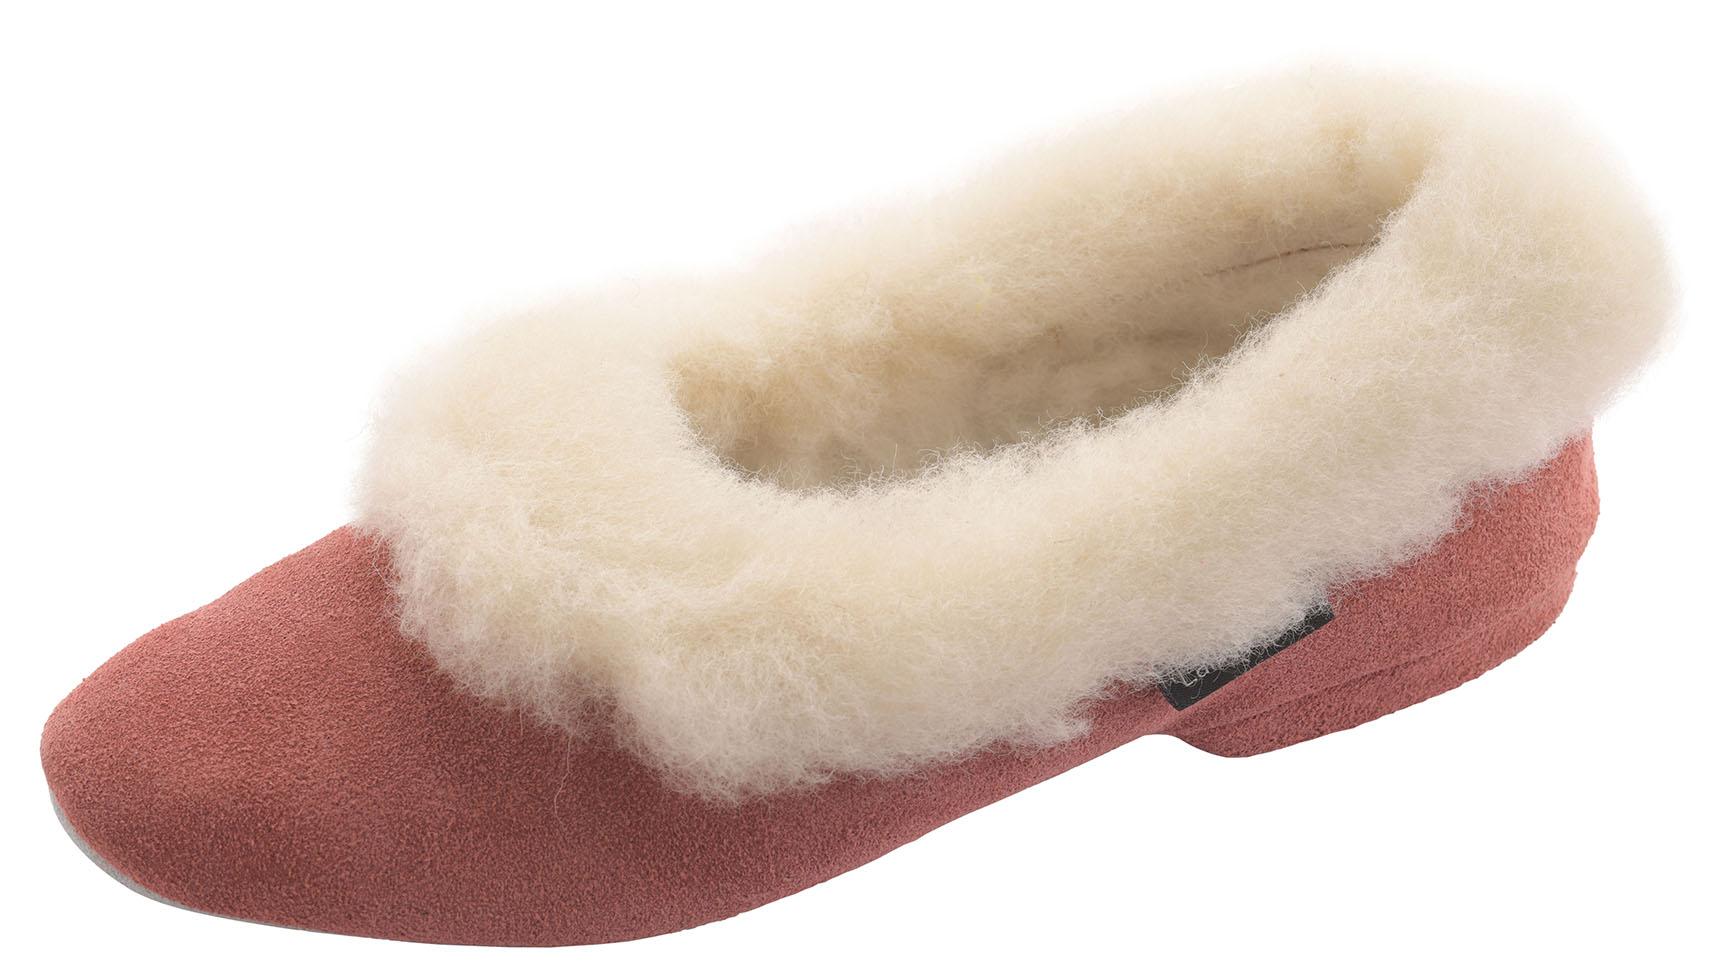 scamosciata Uk5 Pantalone di scamosciata di Uk8 in lana donna pecora Uk4 Uk7 greciano lana Uk6 PxtBfqxF